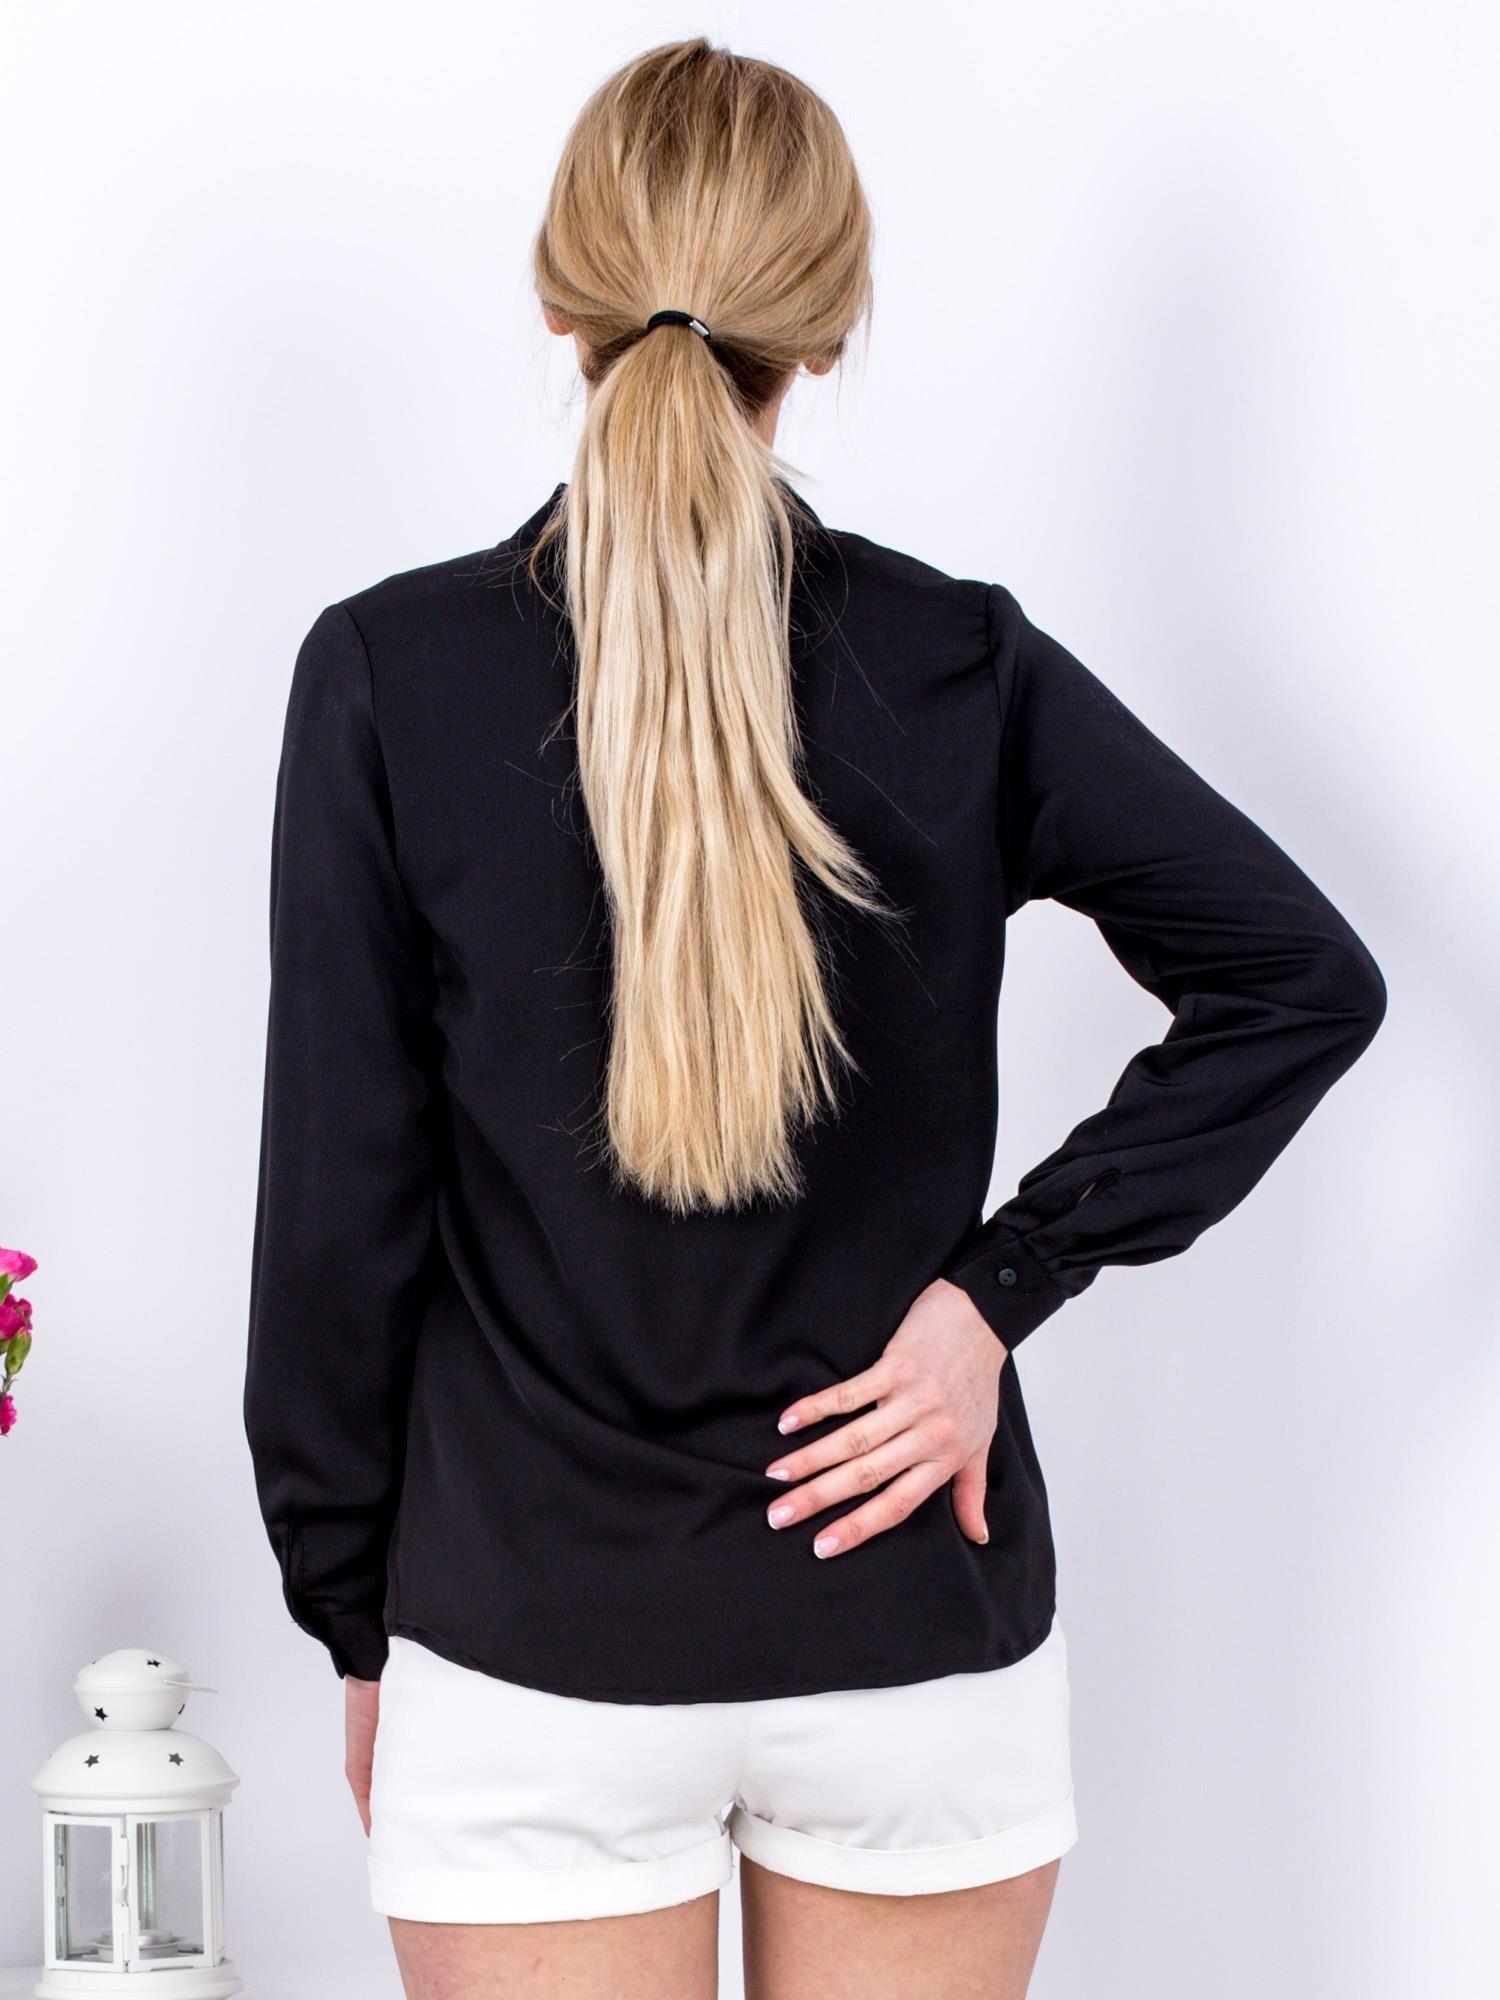 27d1b9ec70a951 Czarna bluzka V-neck - Bluzka na co dzień - sklep eButik.pl